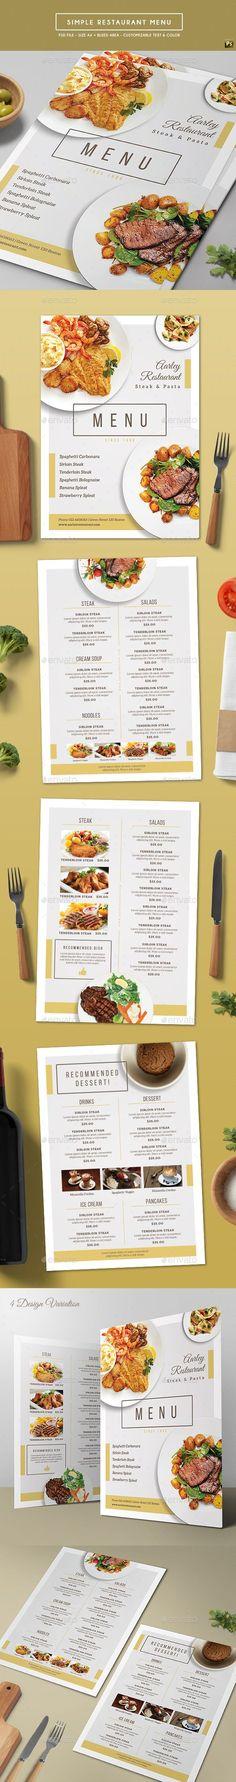 Simple Restaurant Menu — Photoshop PSD #bifold #poster • Download ➝ https://graphicriver.net/item/simple-restaurant-menu/19201609?ref=pxcr